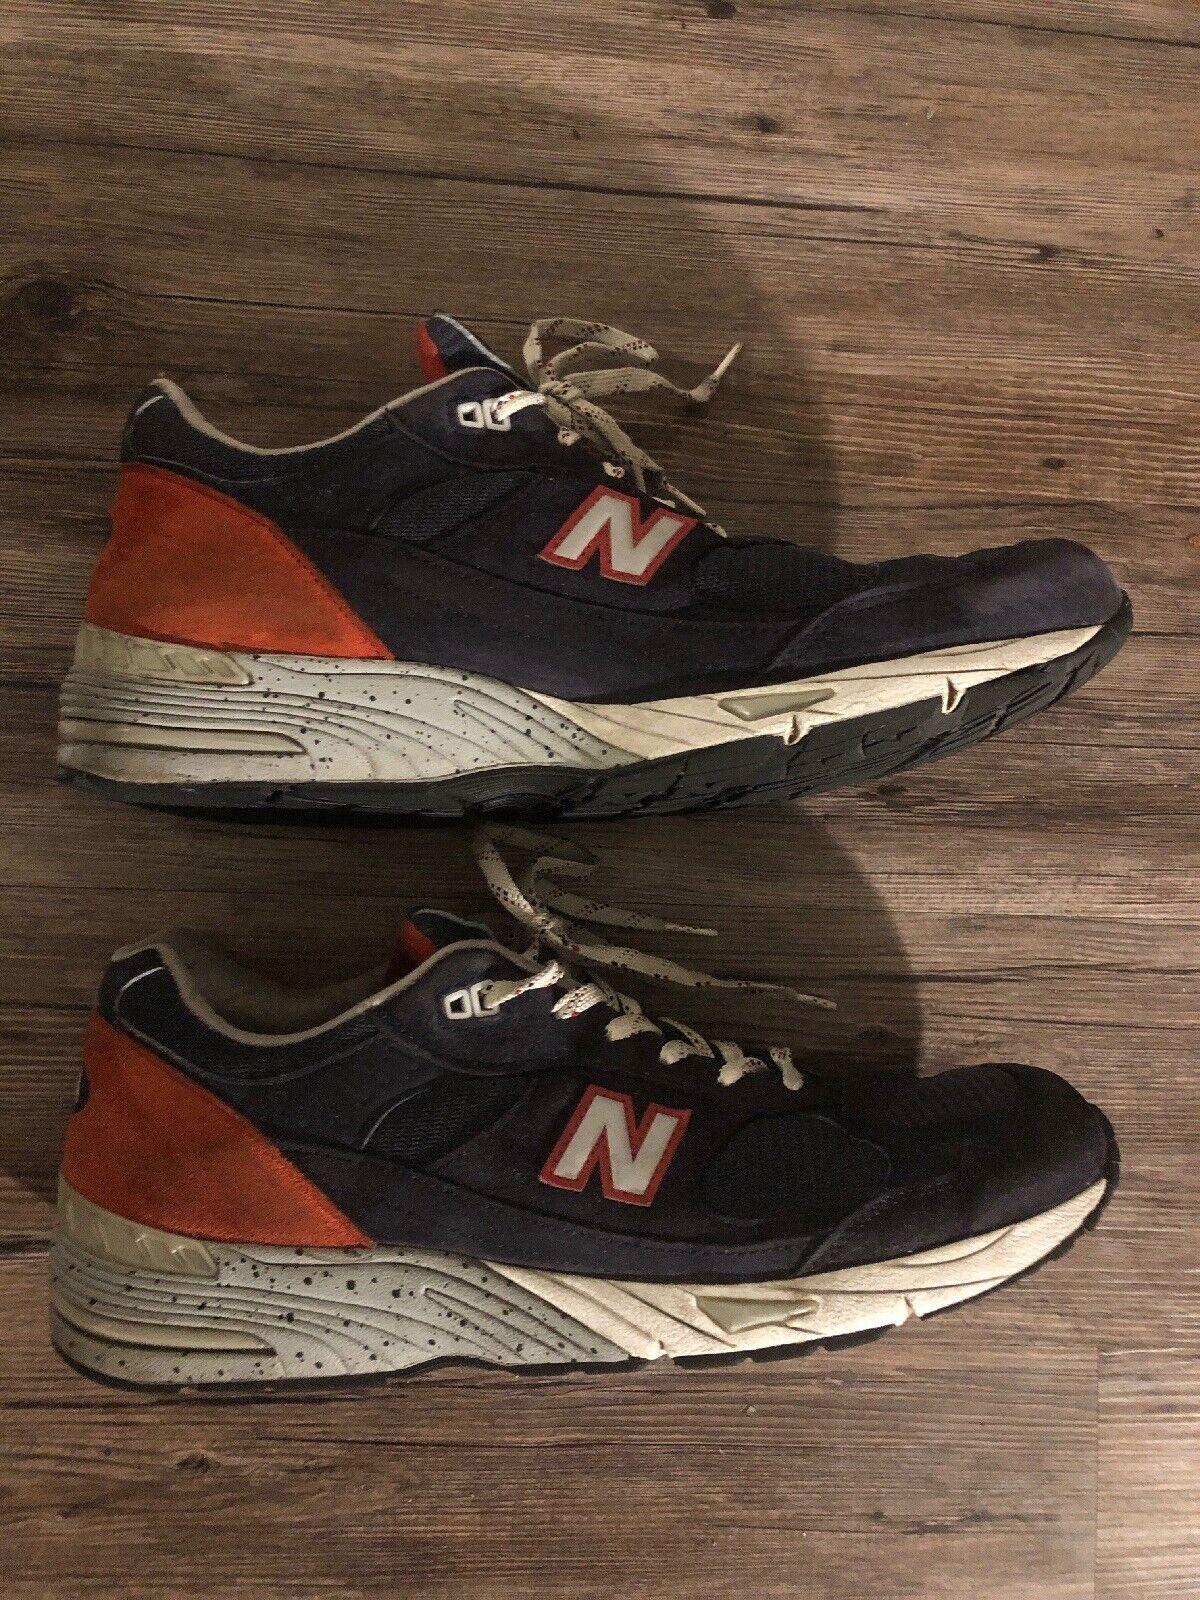 New Balance 991 Navy Maroon Men's Size 13 Running shoes Rare NB M991BB USA